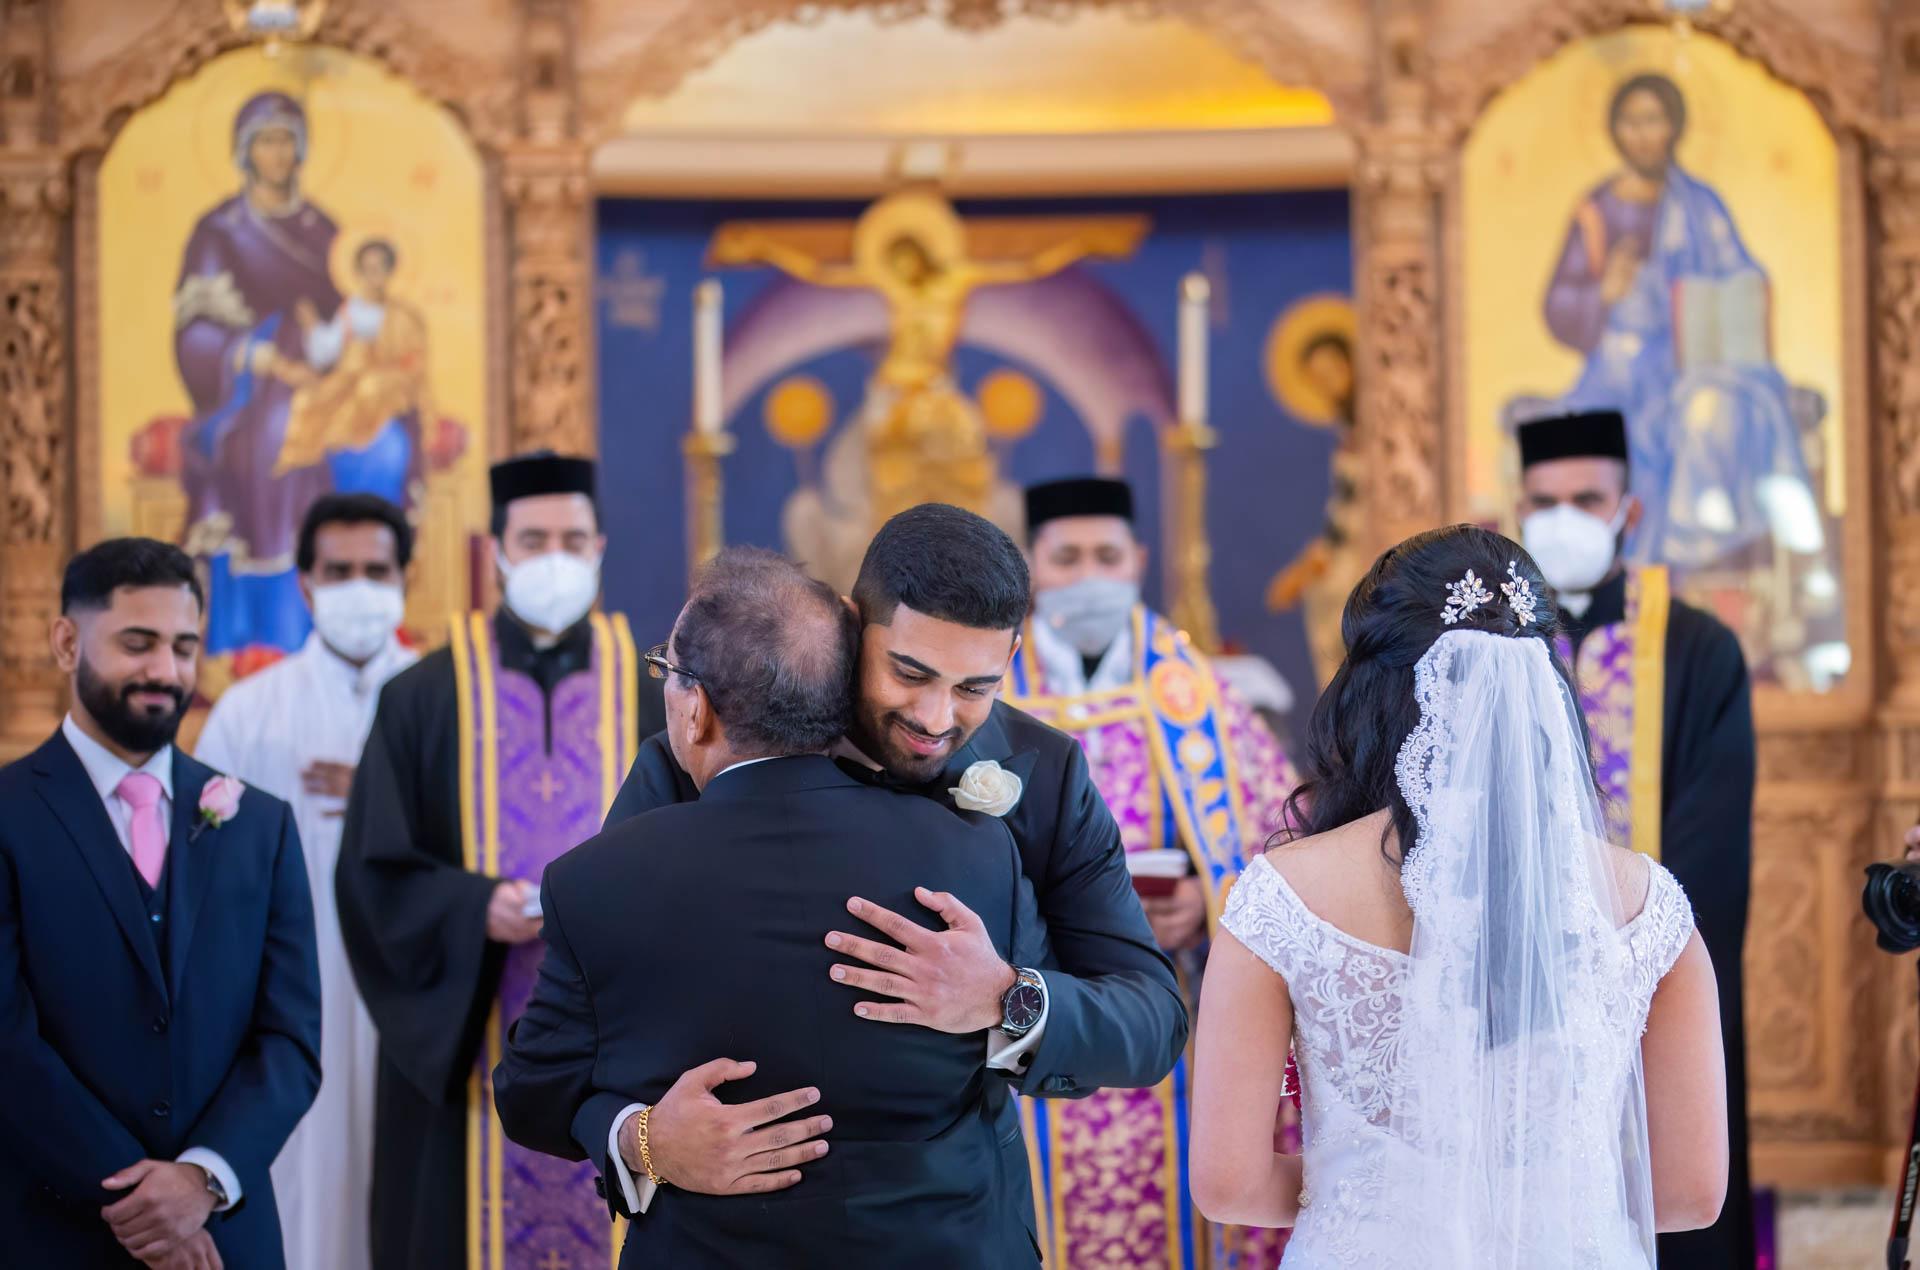 WESTMOUNT COUNTRY CLUB INDIAN WEDDING 9